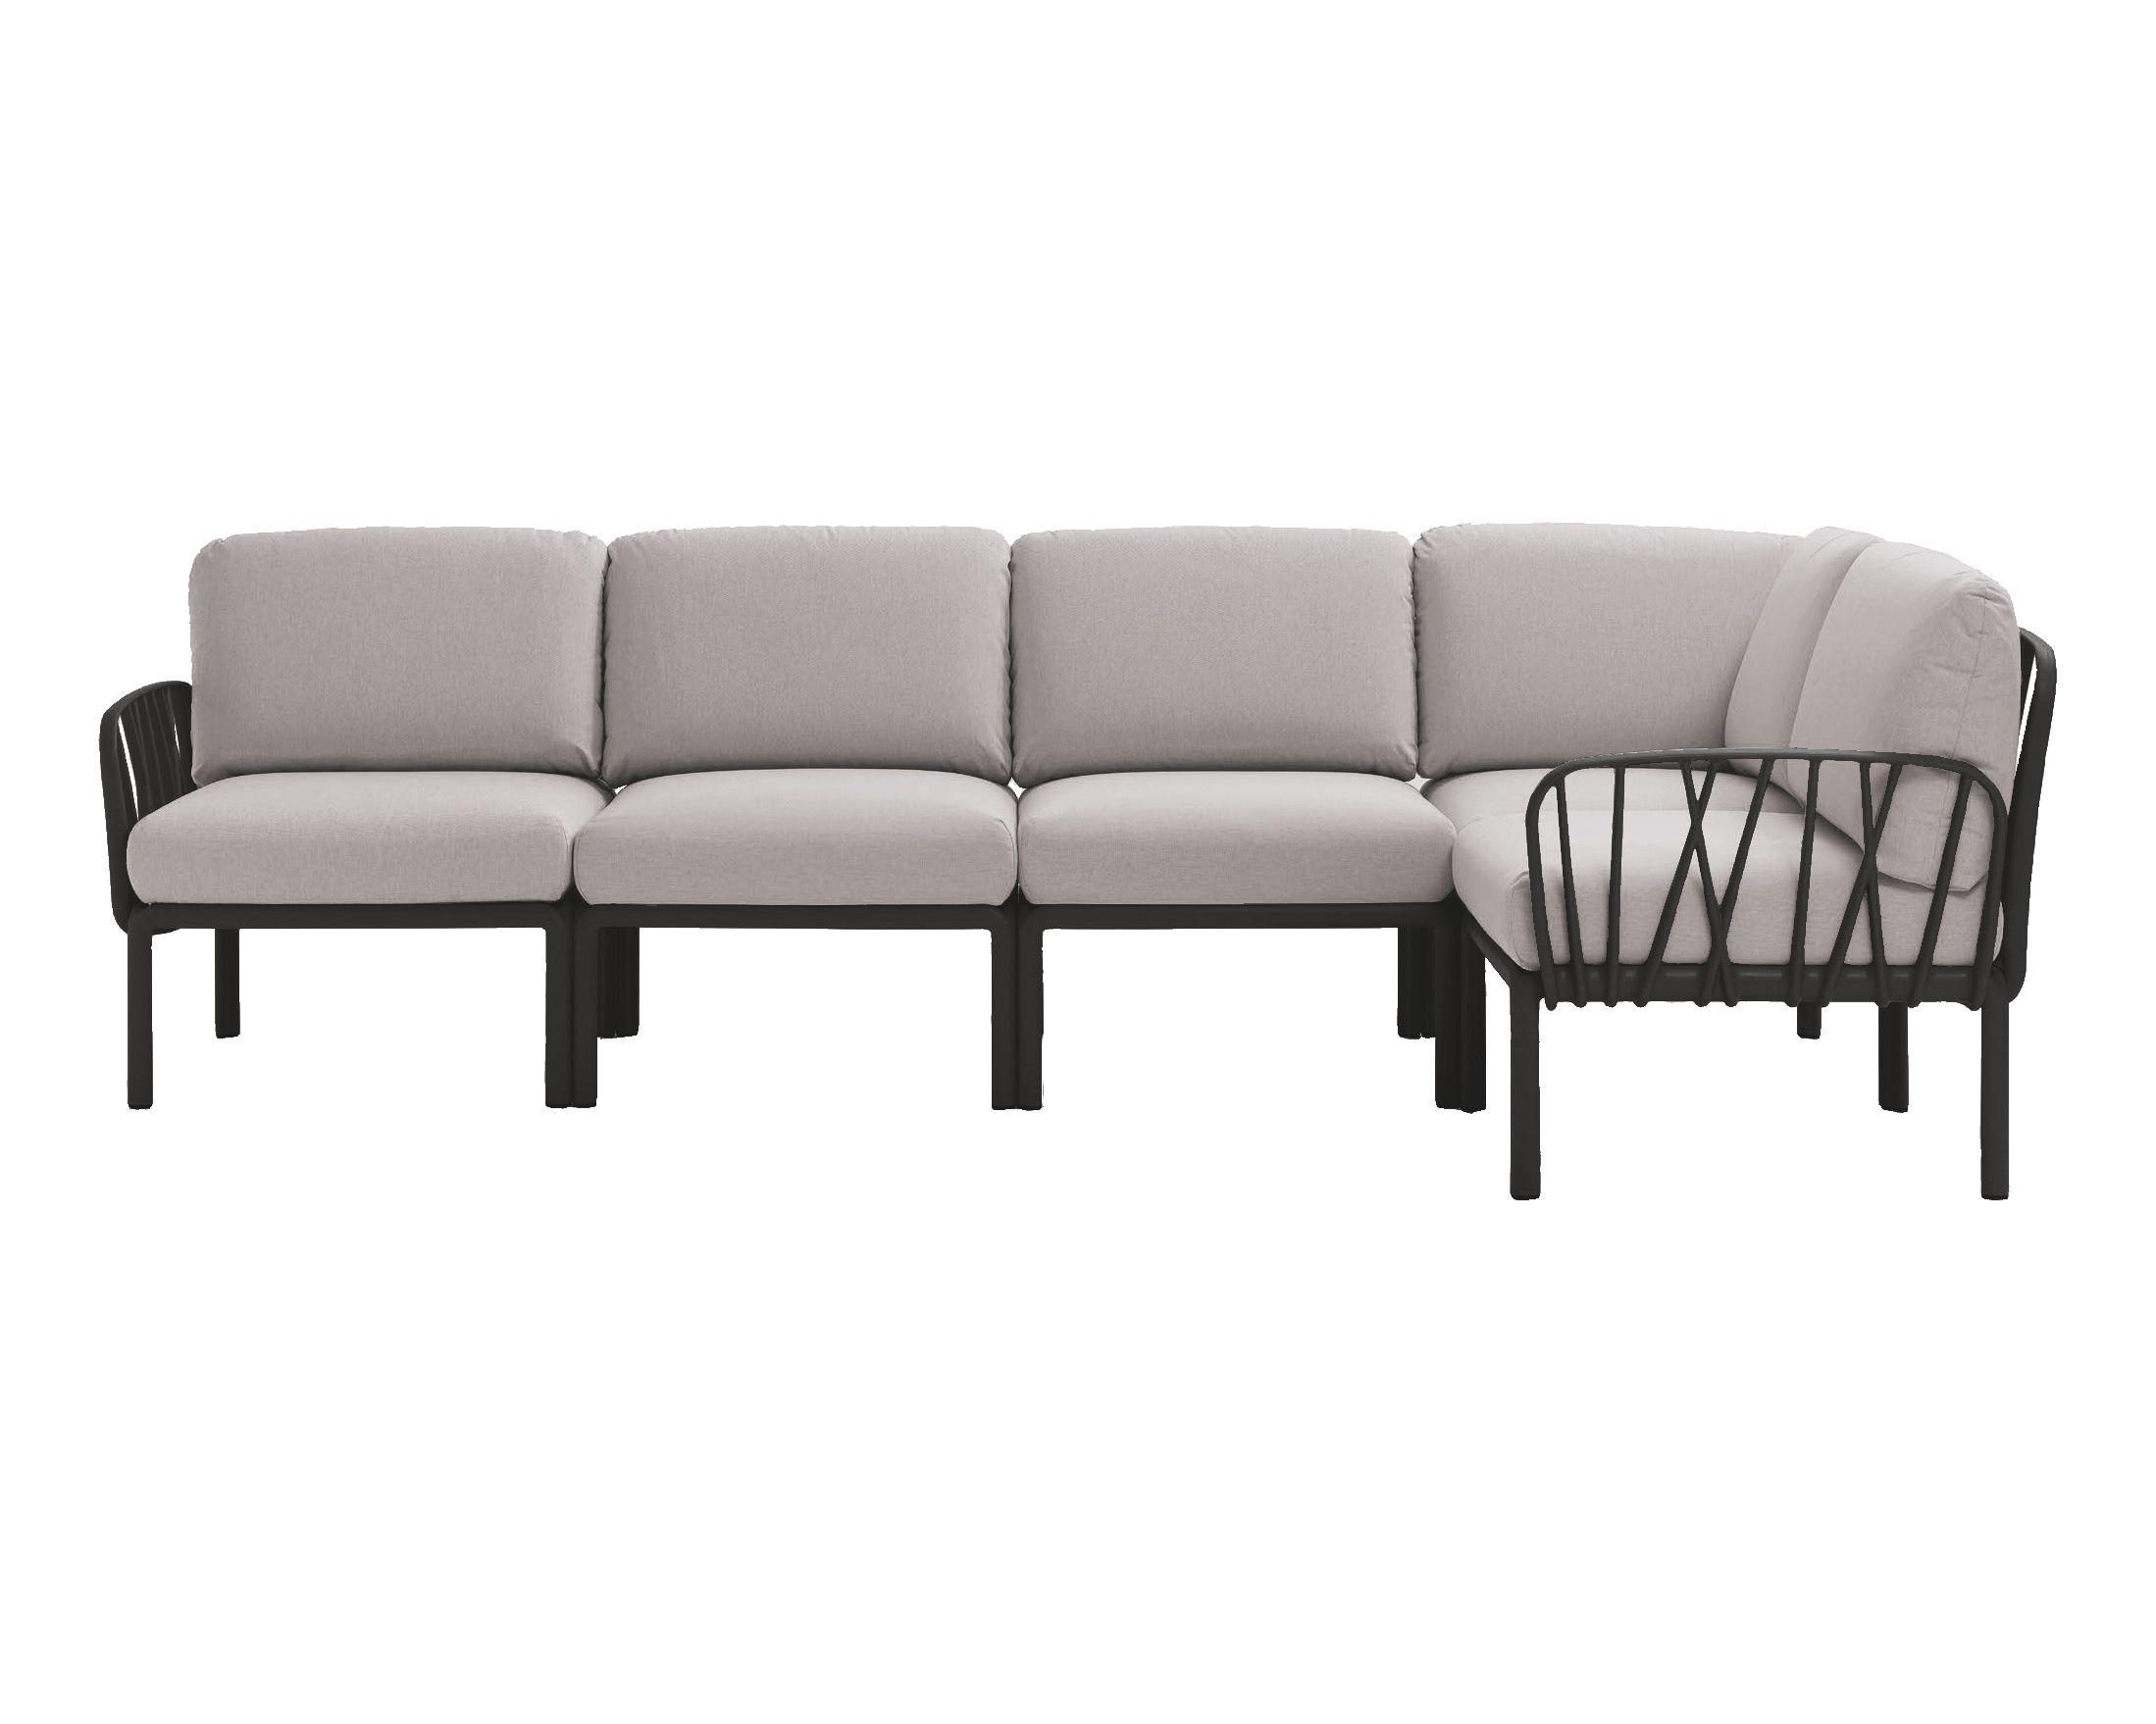 Lounge Modica